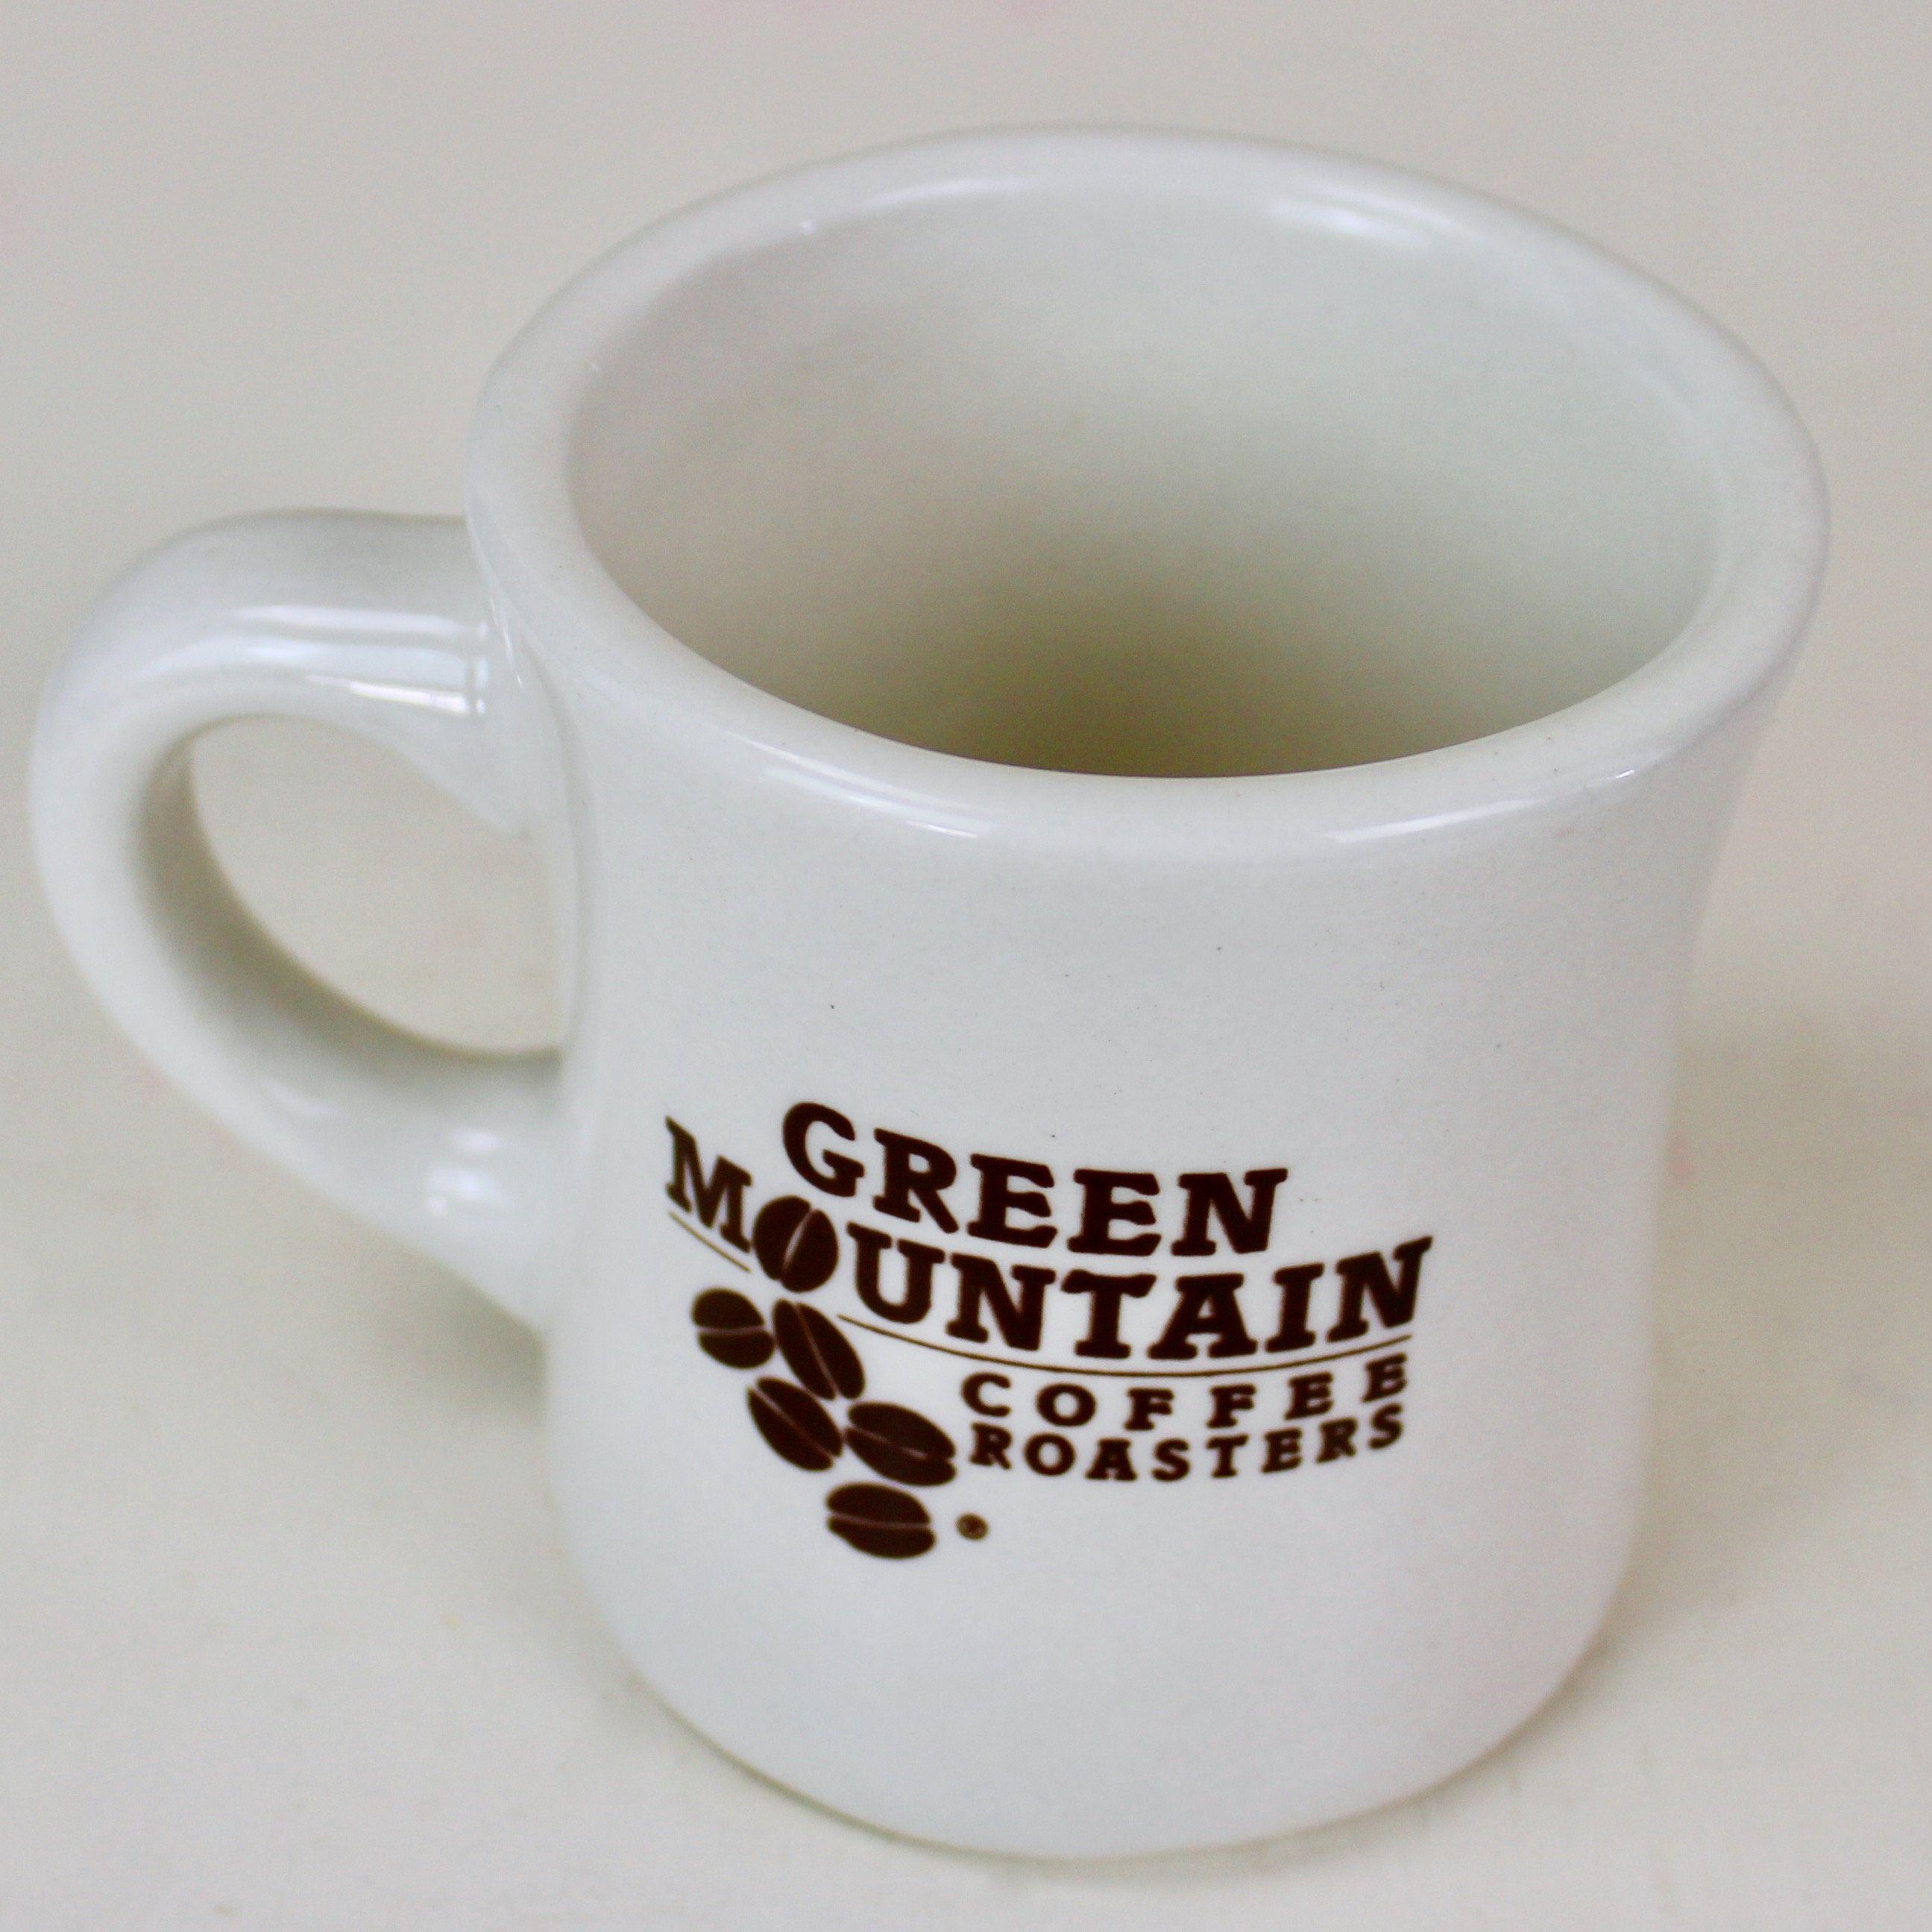 Green Mountain Coffee Roasters Mug Heavy White Stoneware Restaurant Ware Tea Cup Vermont 10 Oz Mugs Tea Cups